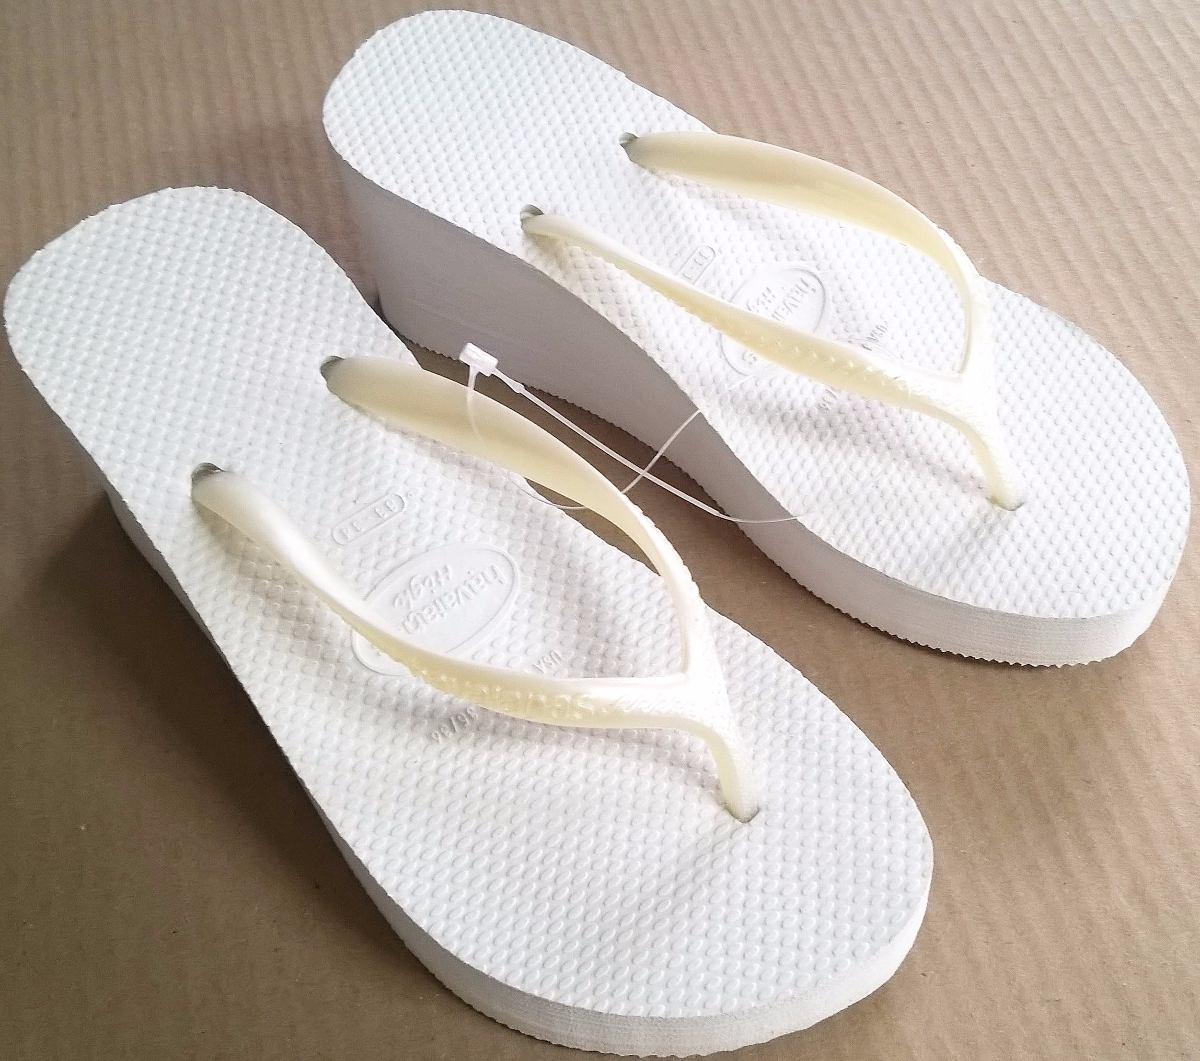 46d556952a843b sandalia chinelo havaianas high fashion branca salto 6 cm. Carregando zoom.